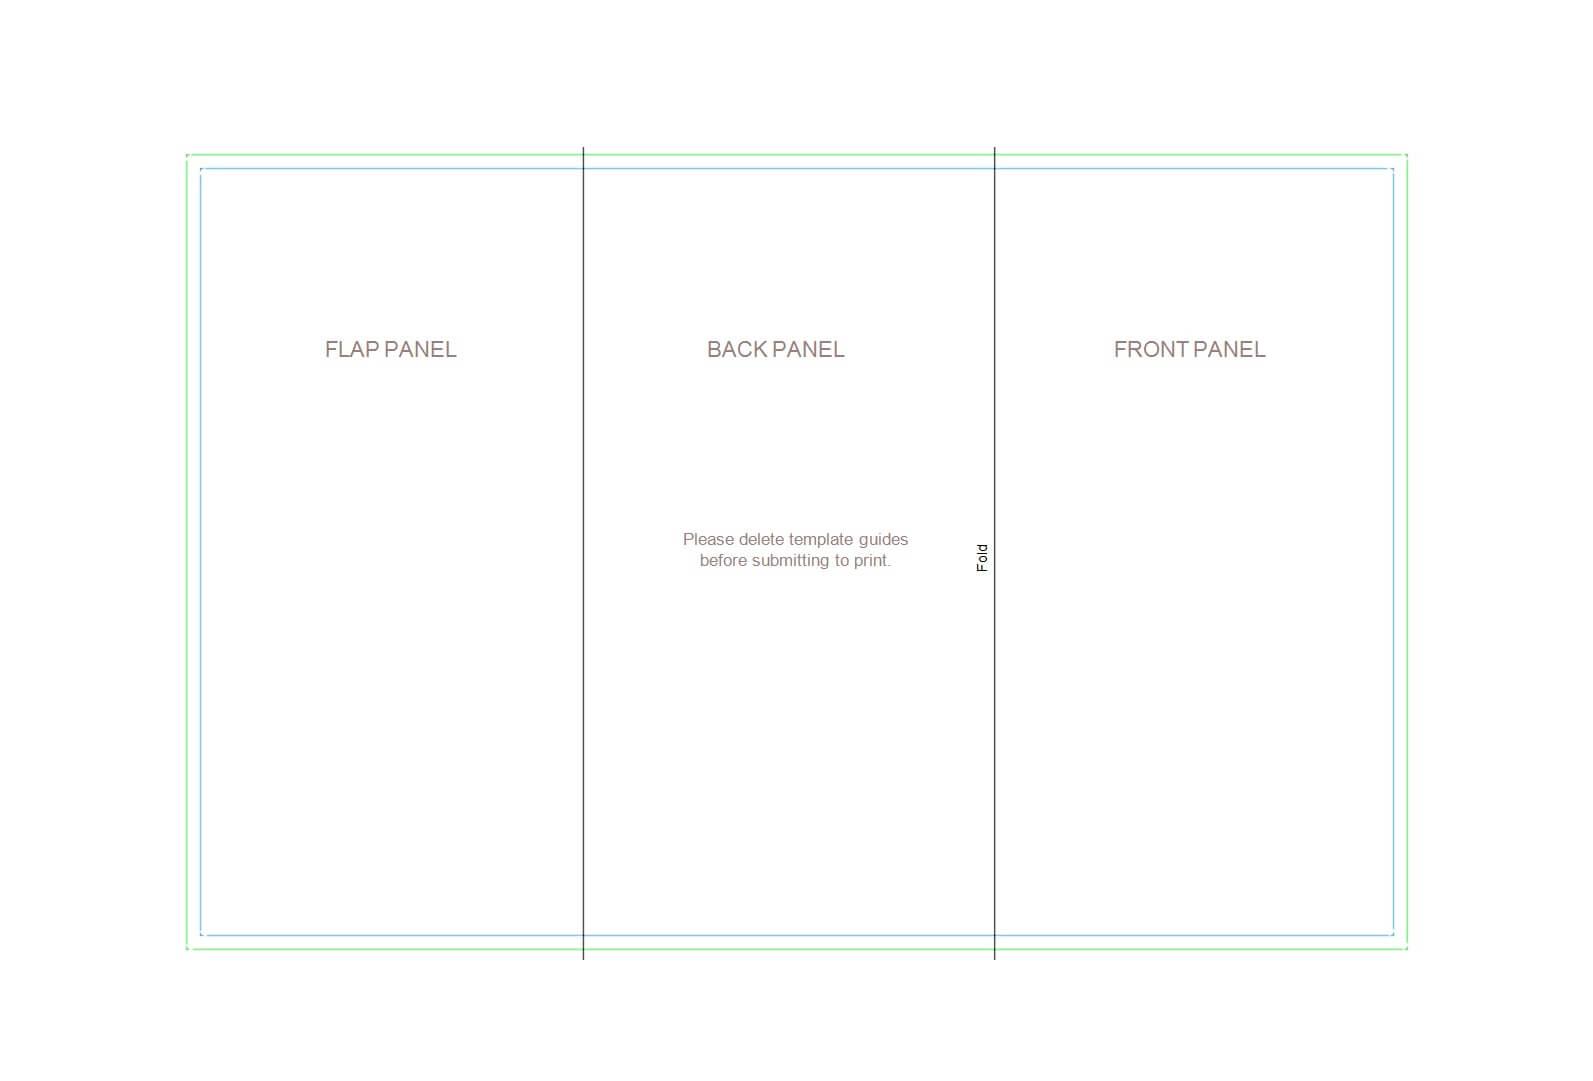 021 Pamphlet Template Blank Tri Fold Brochure Google Docs In Google Docs Tri Fold Brochure Template